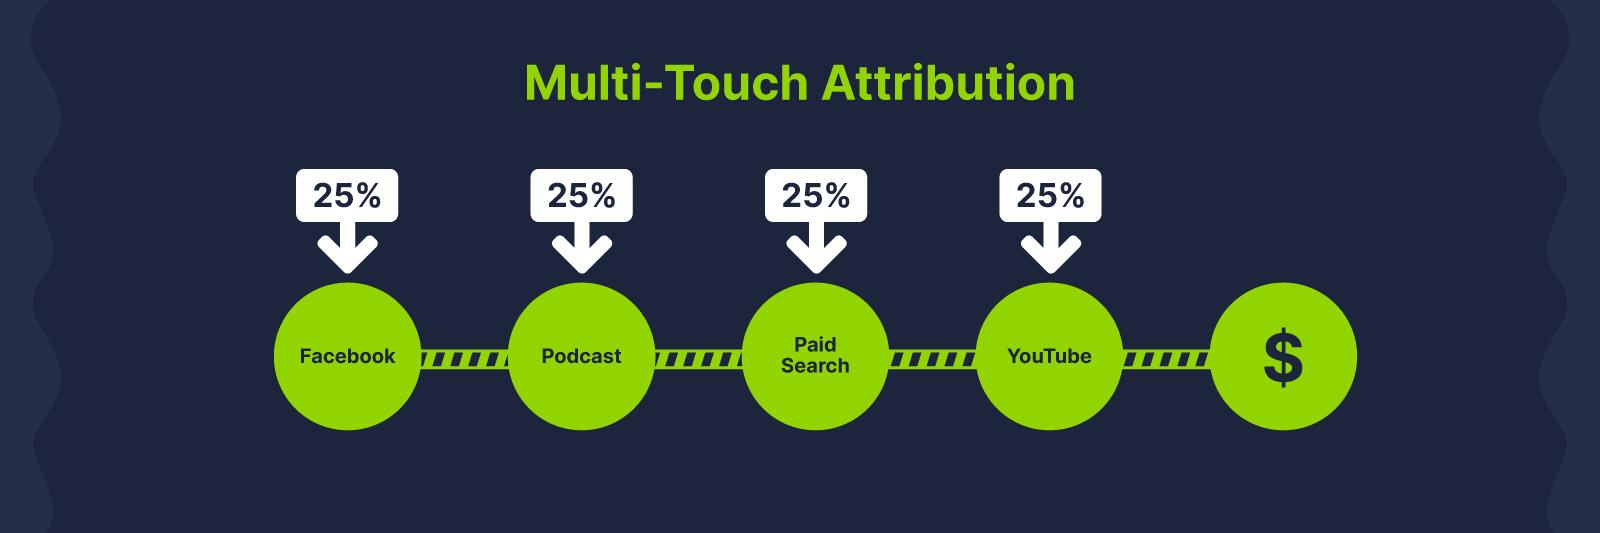 multi-touch marketing attribution